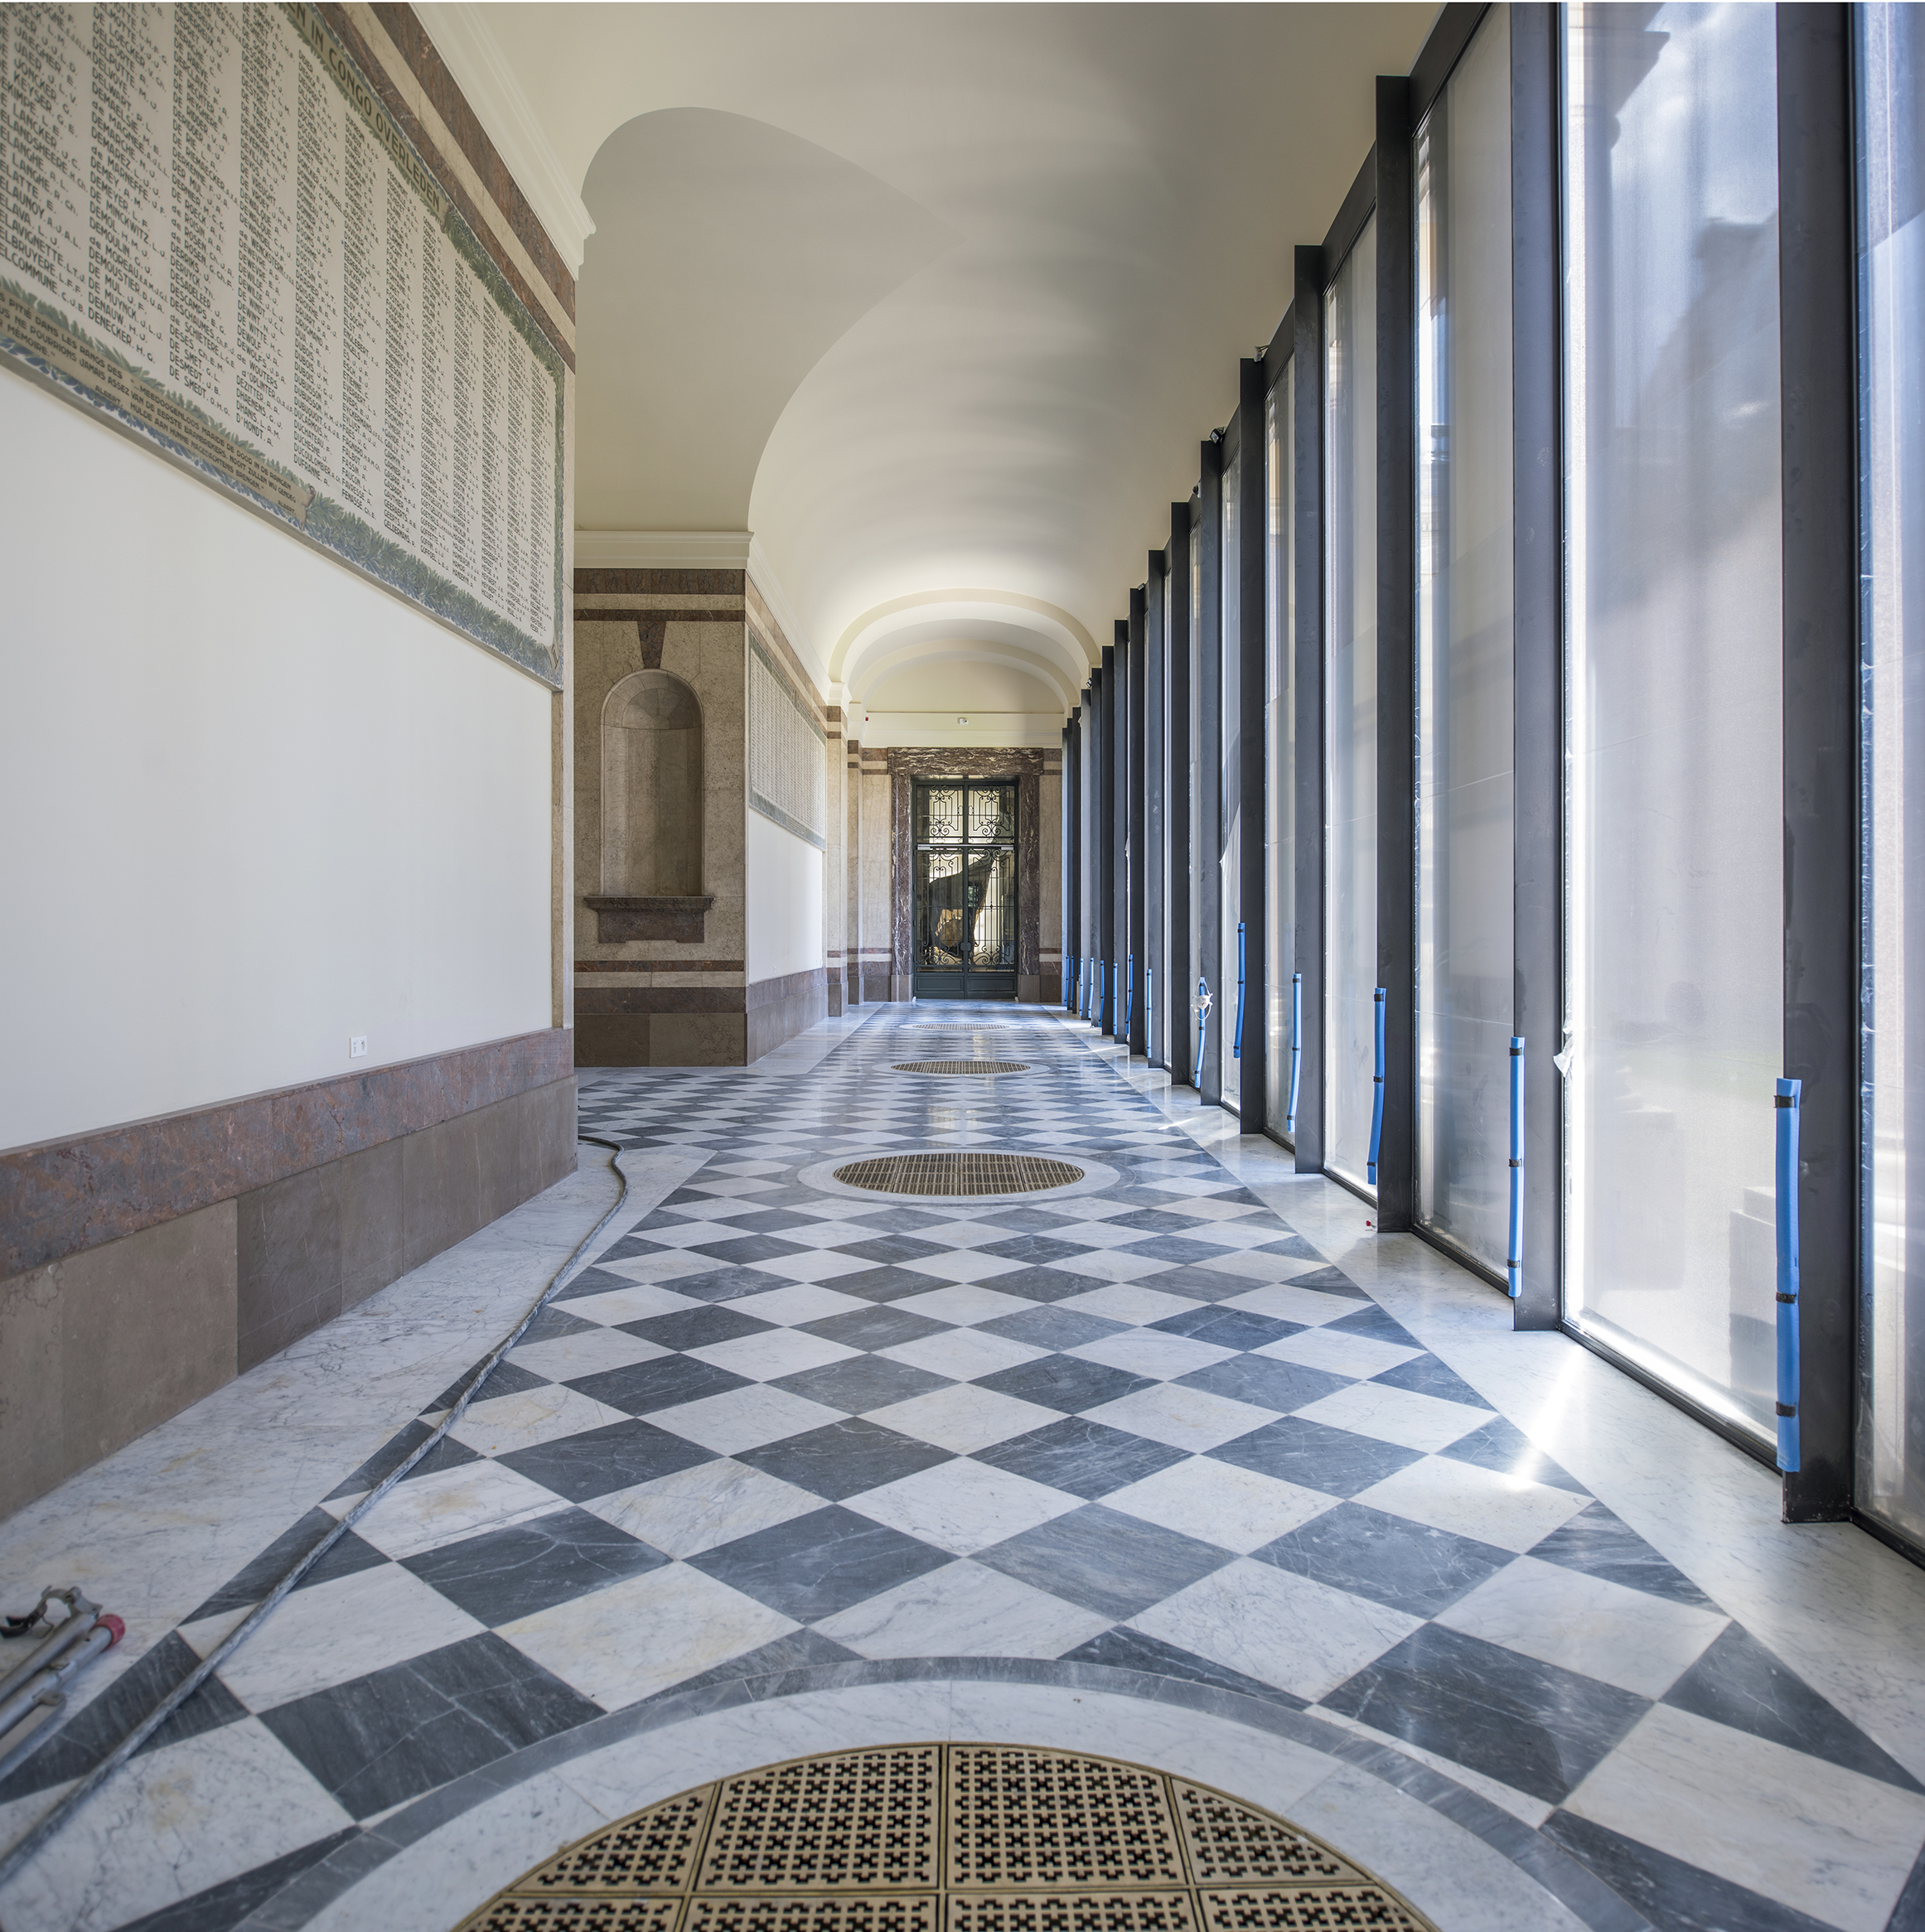 100 dpi pano hallway war memorial.jpg